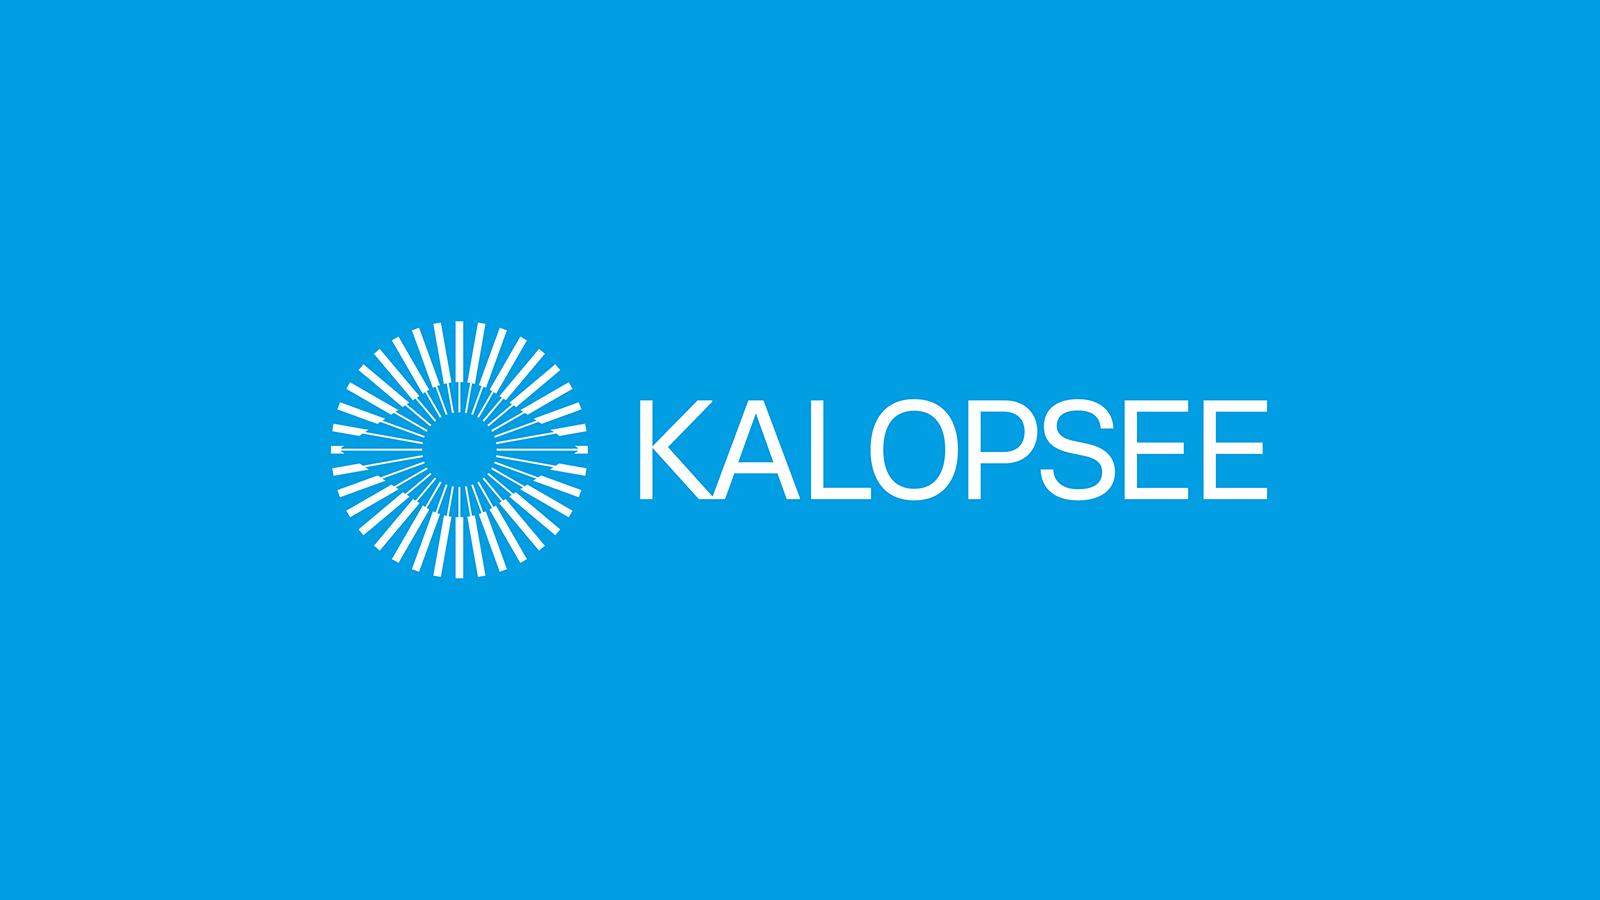 Kalopsee - Branding and Visual Identity